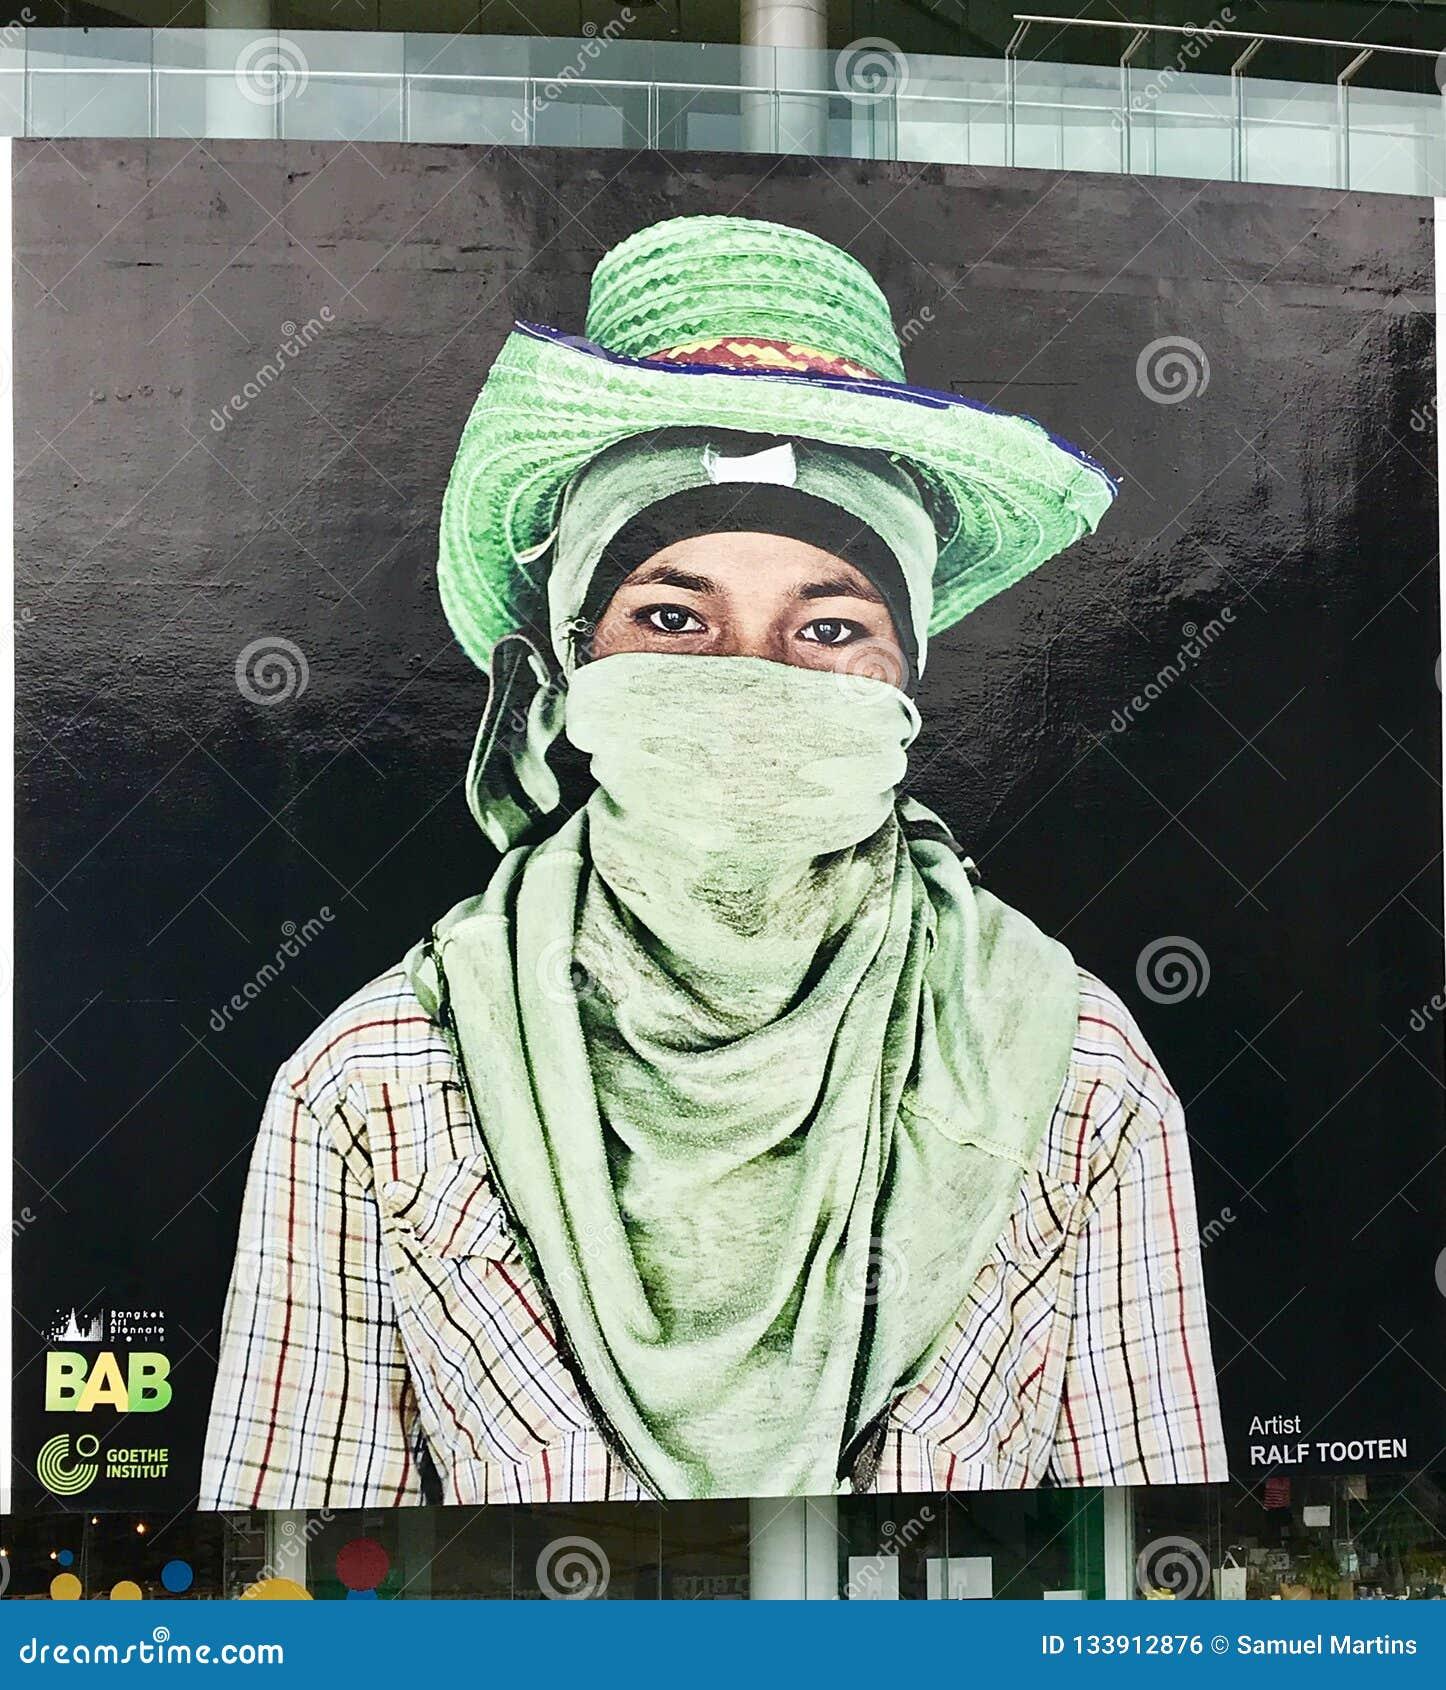 Graffiti in Bangkok, Thailand